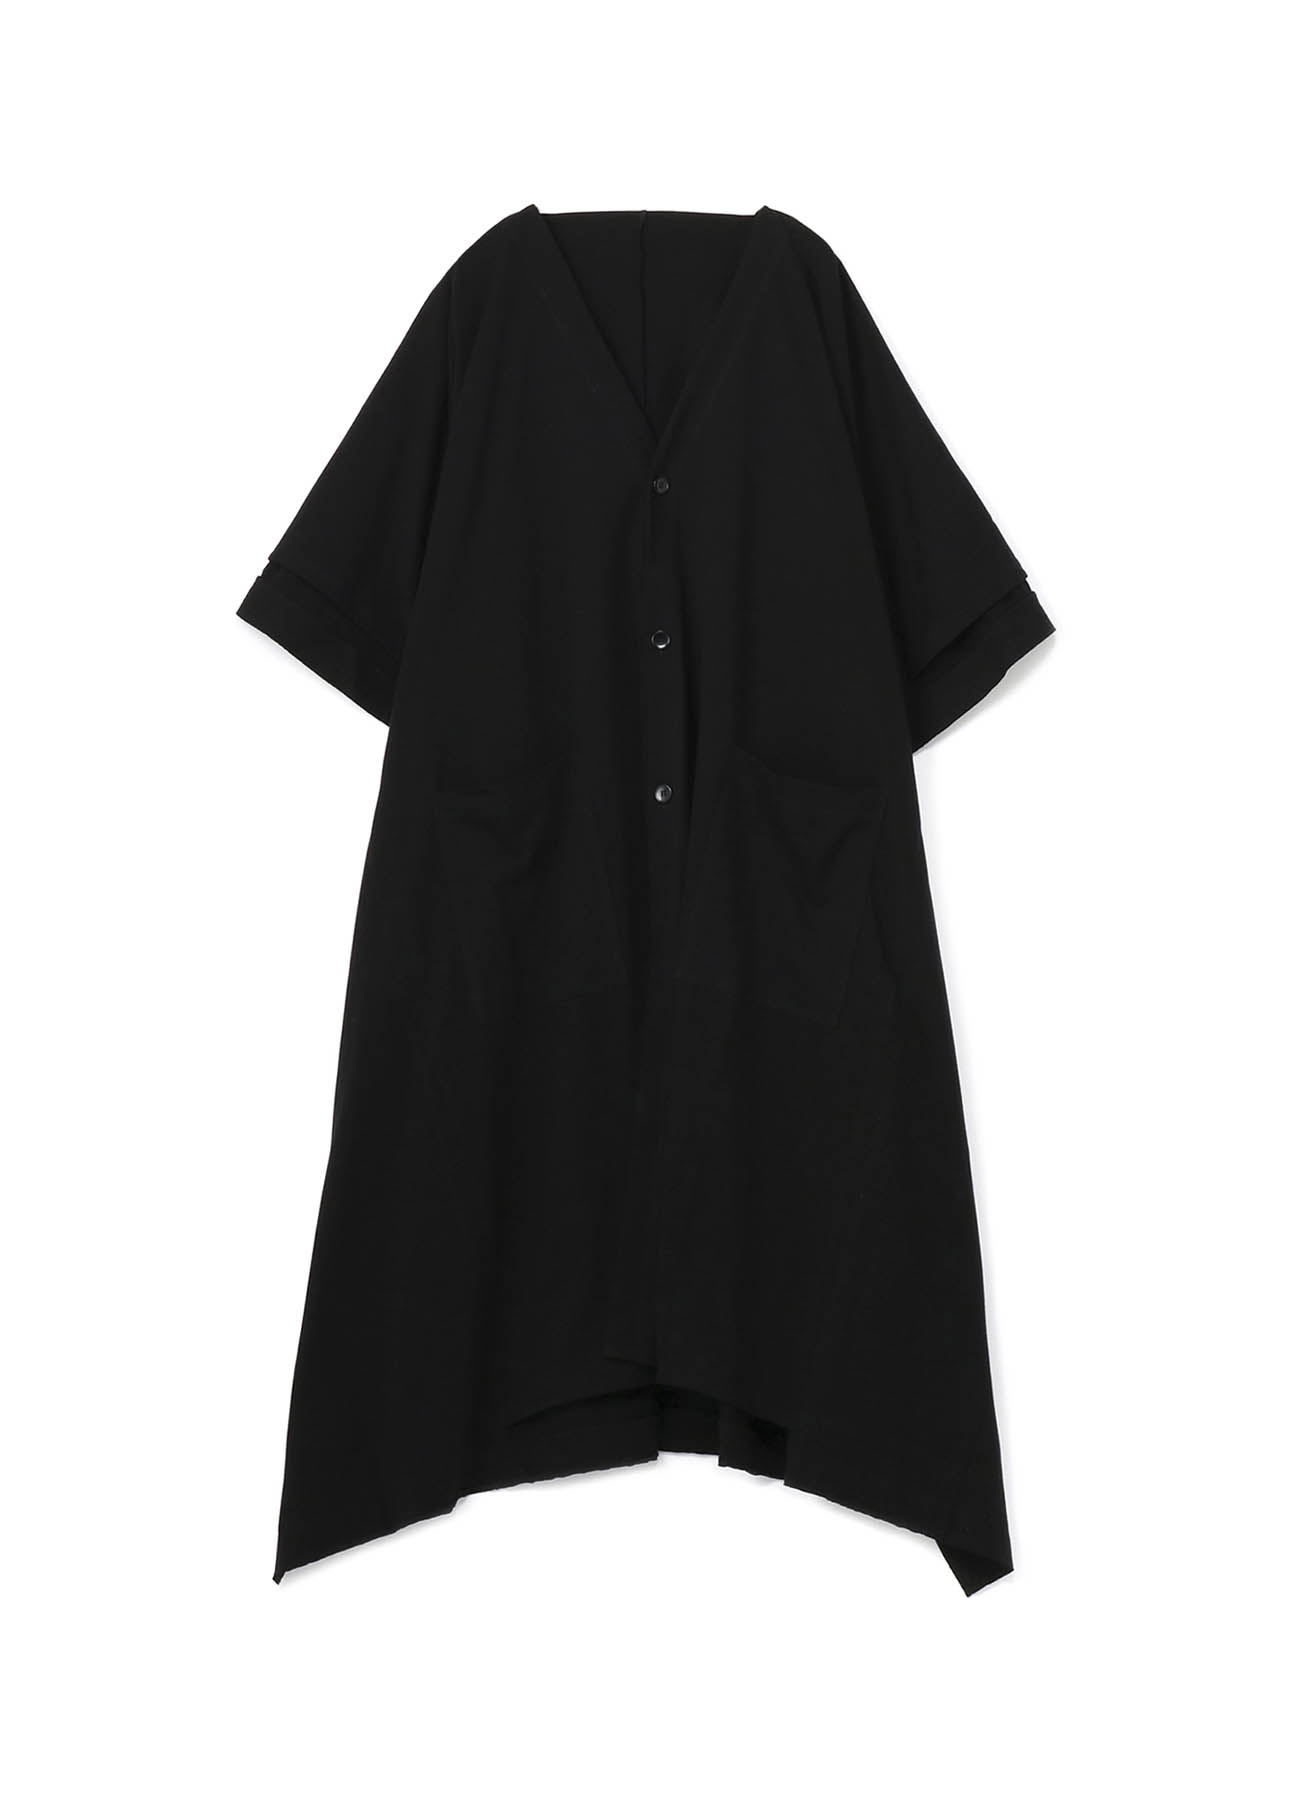 30/cotton Jersey GY Cardigan